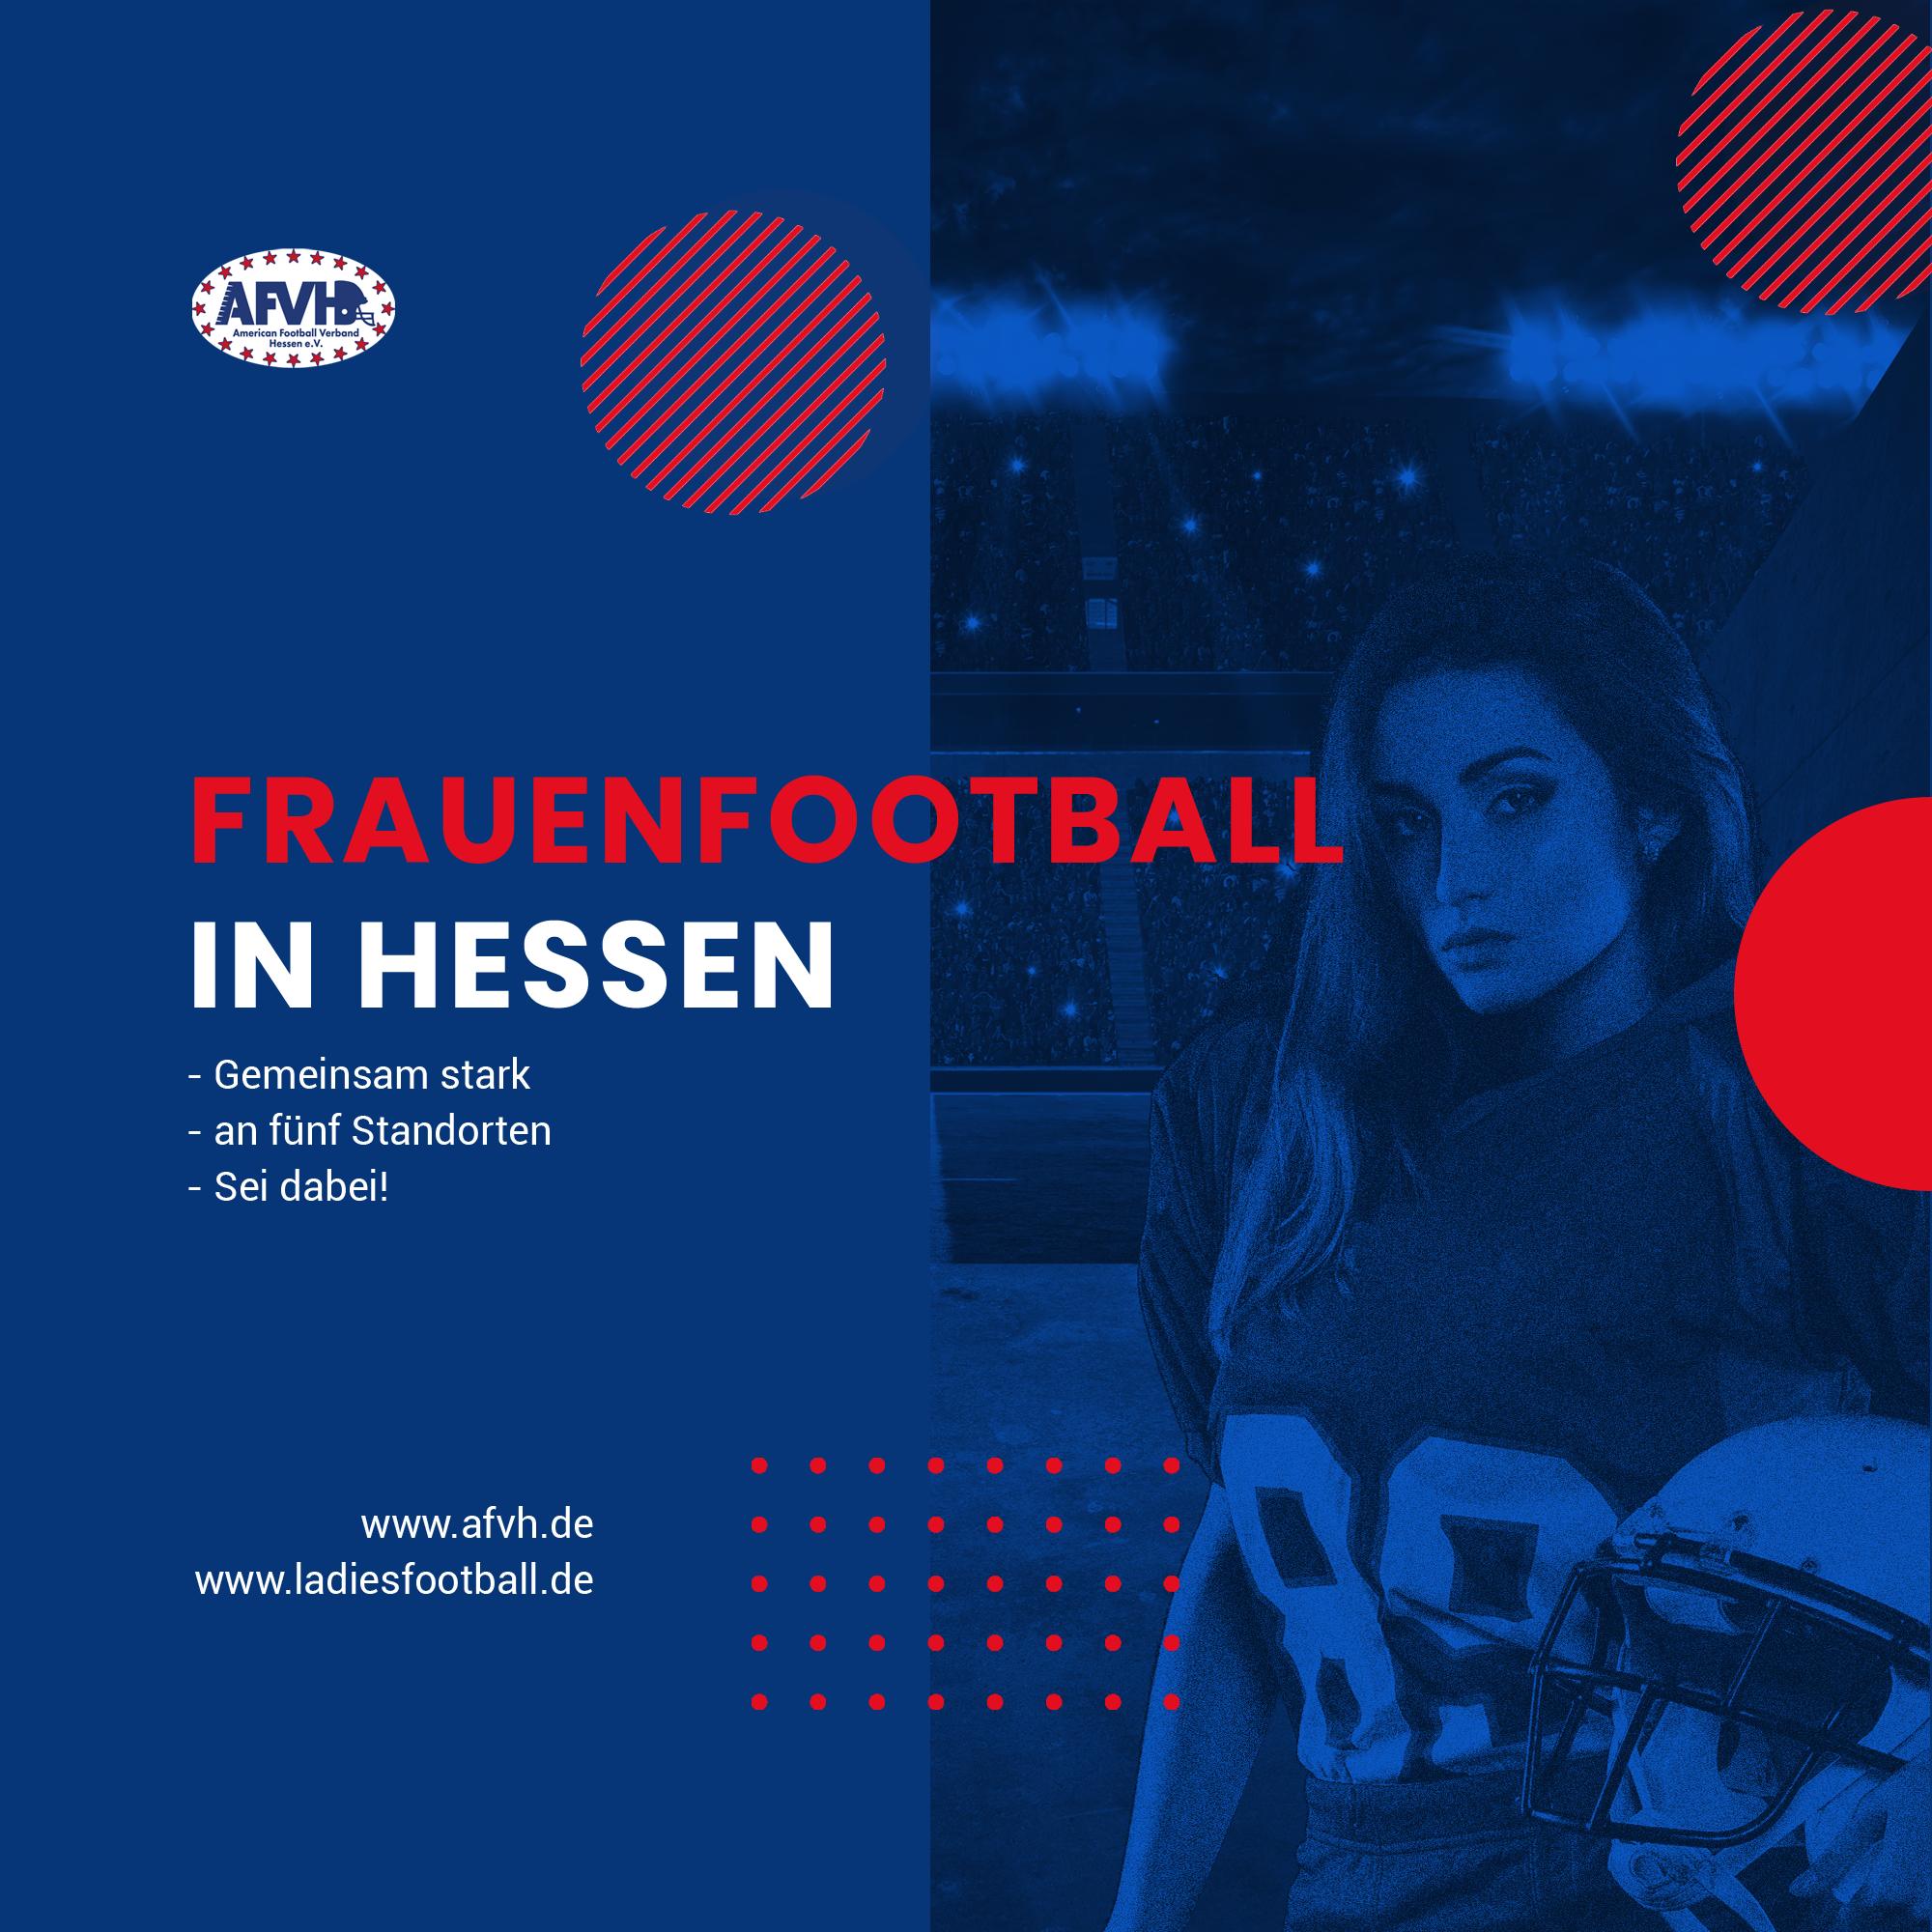 AFVH Frauenfootball